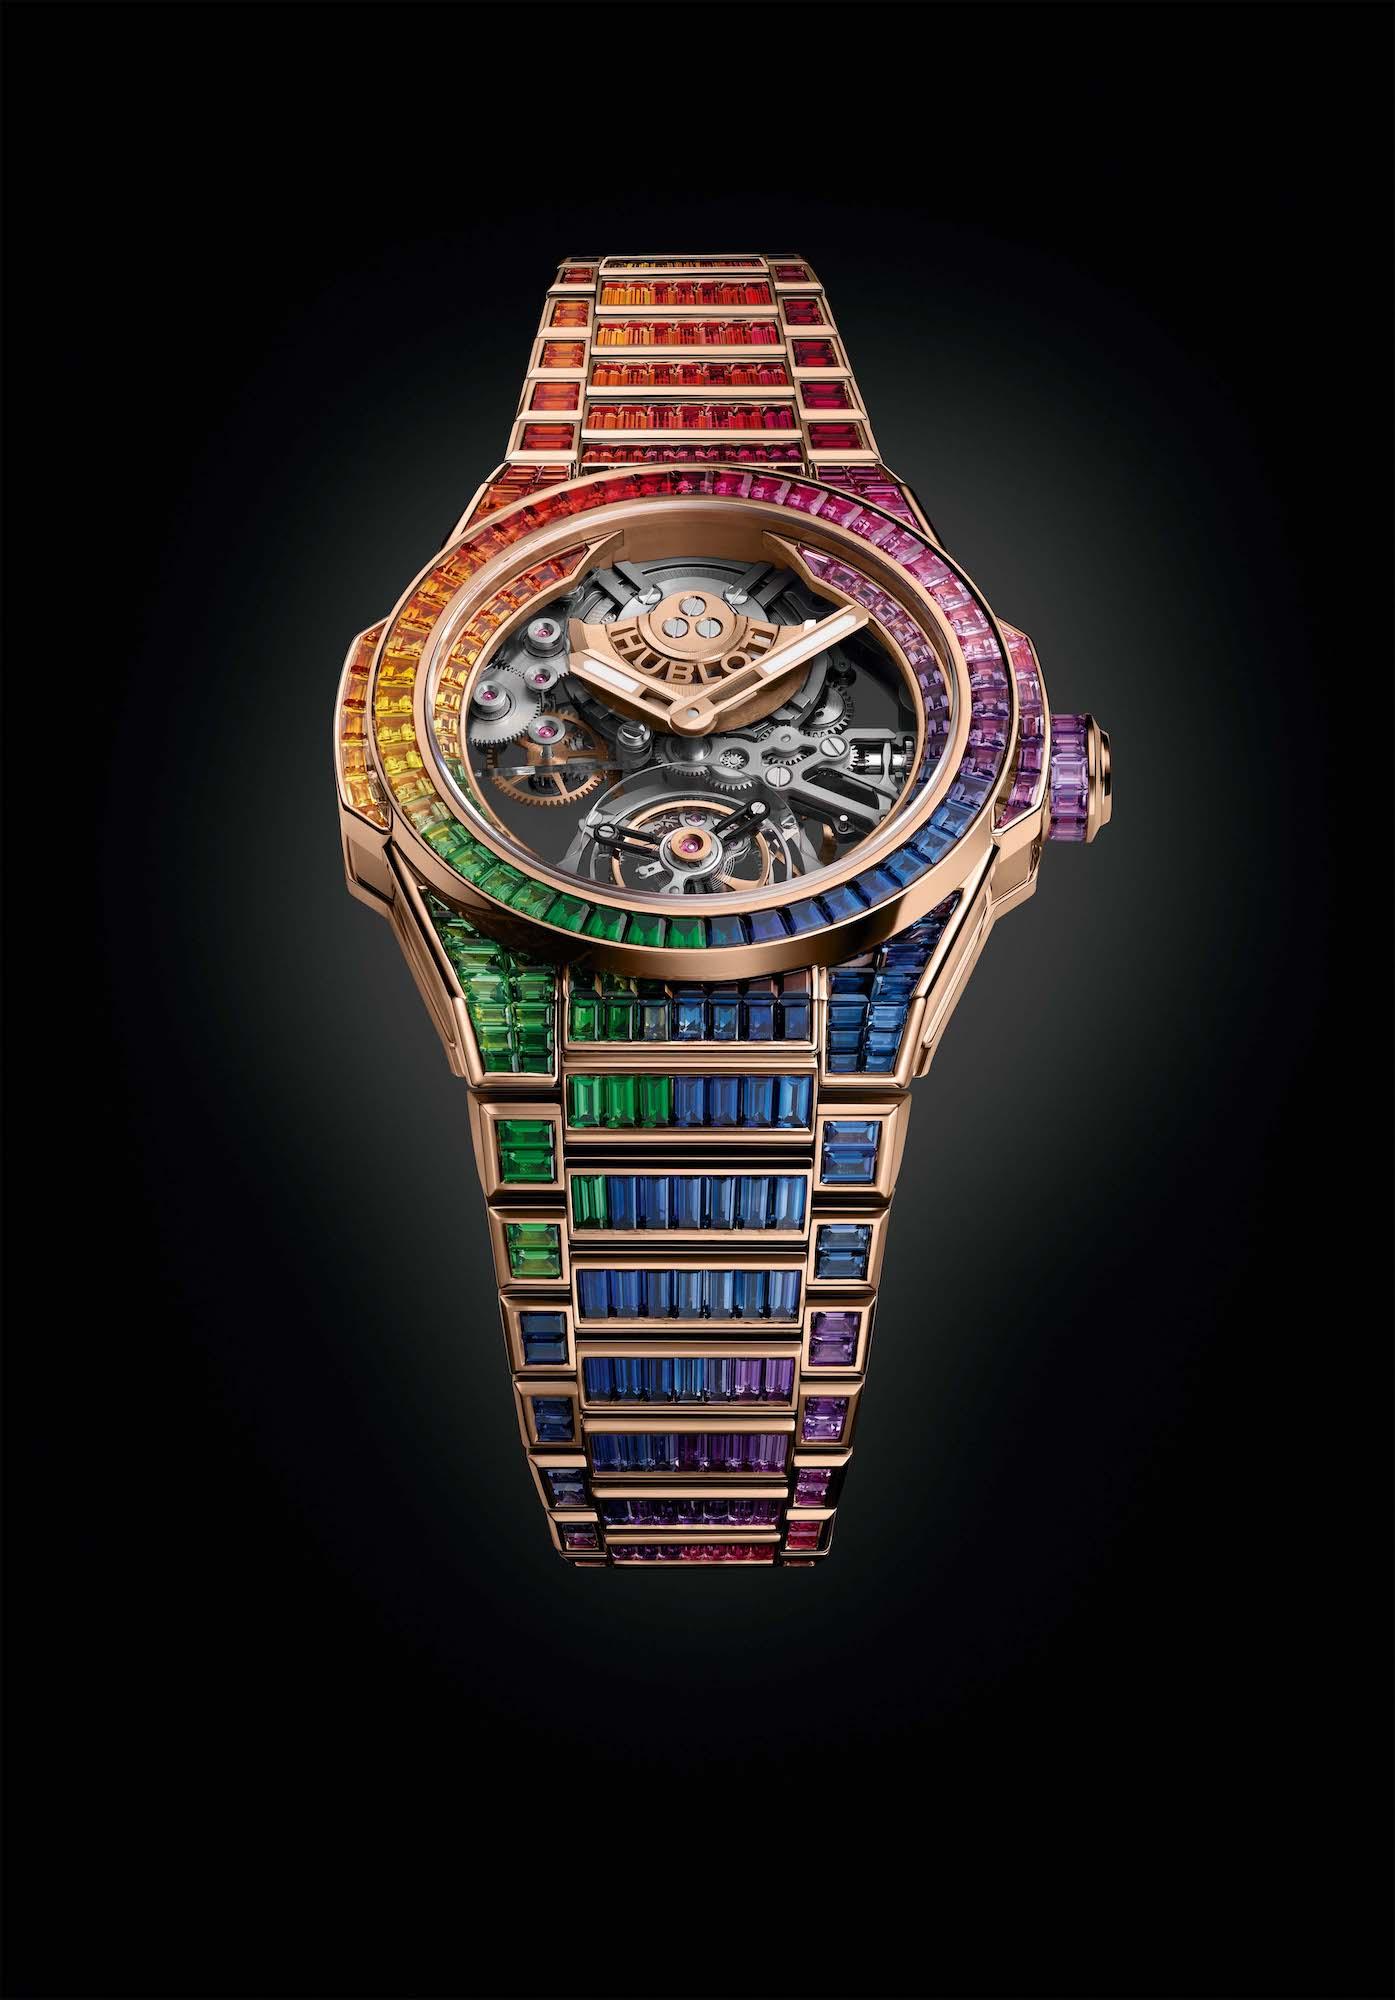 Hublot Big Bang Integral Tourbillon Rainbow 455.OX.9900.OX.9999